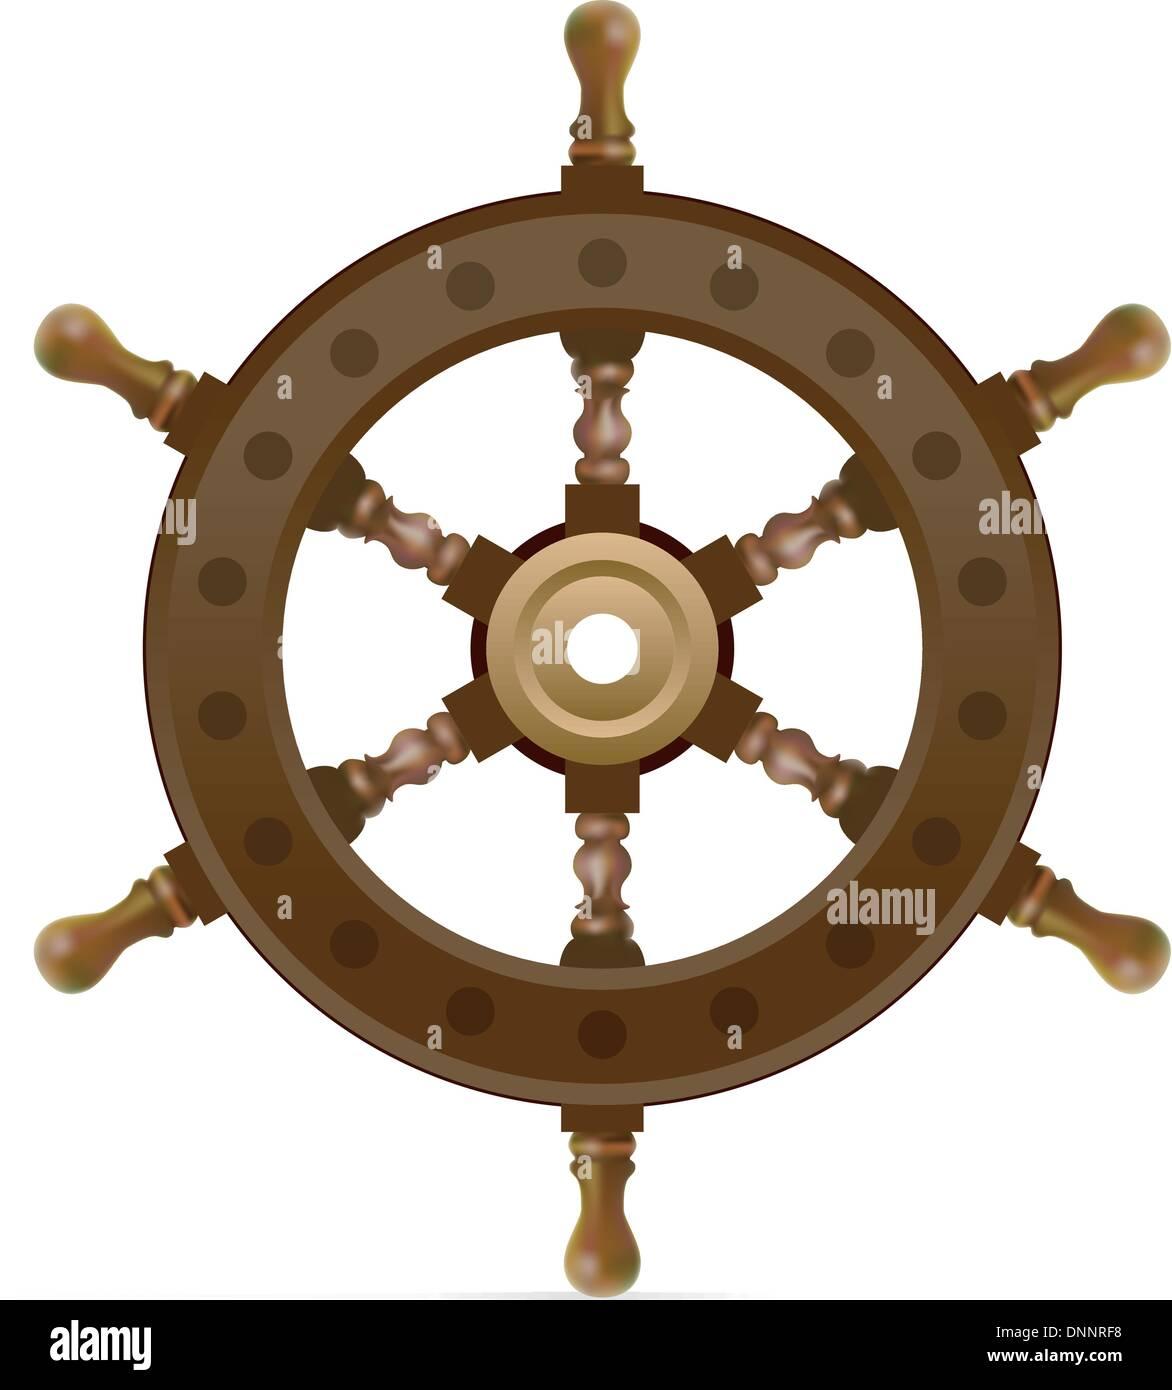 steering control - Stock Image